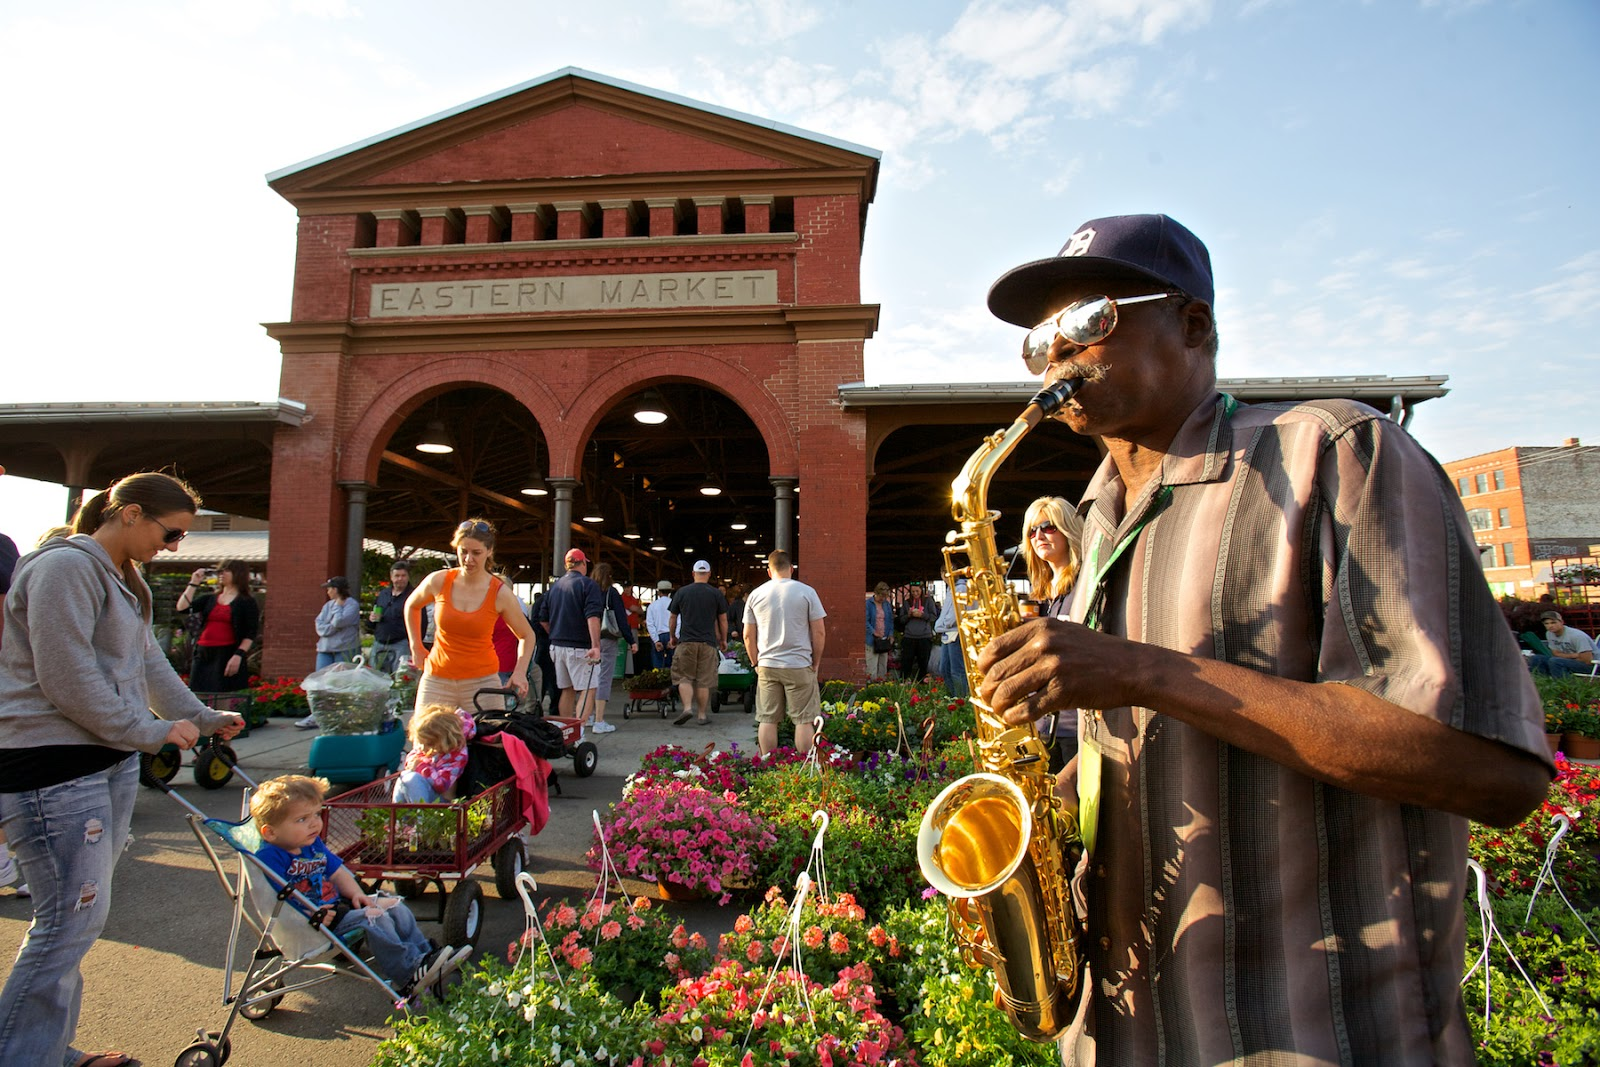 Tuesdays at Eastern Market - Detroit